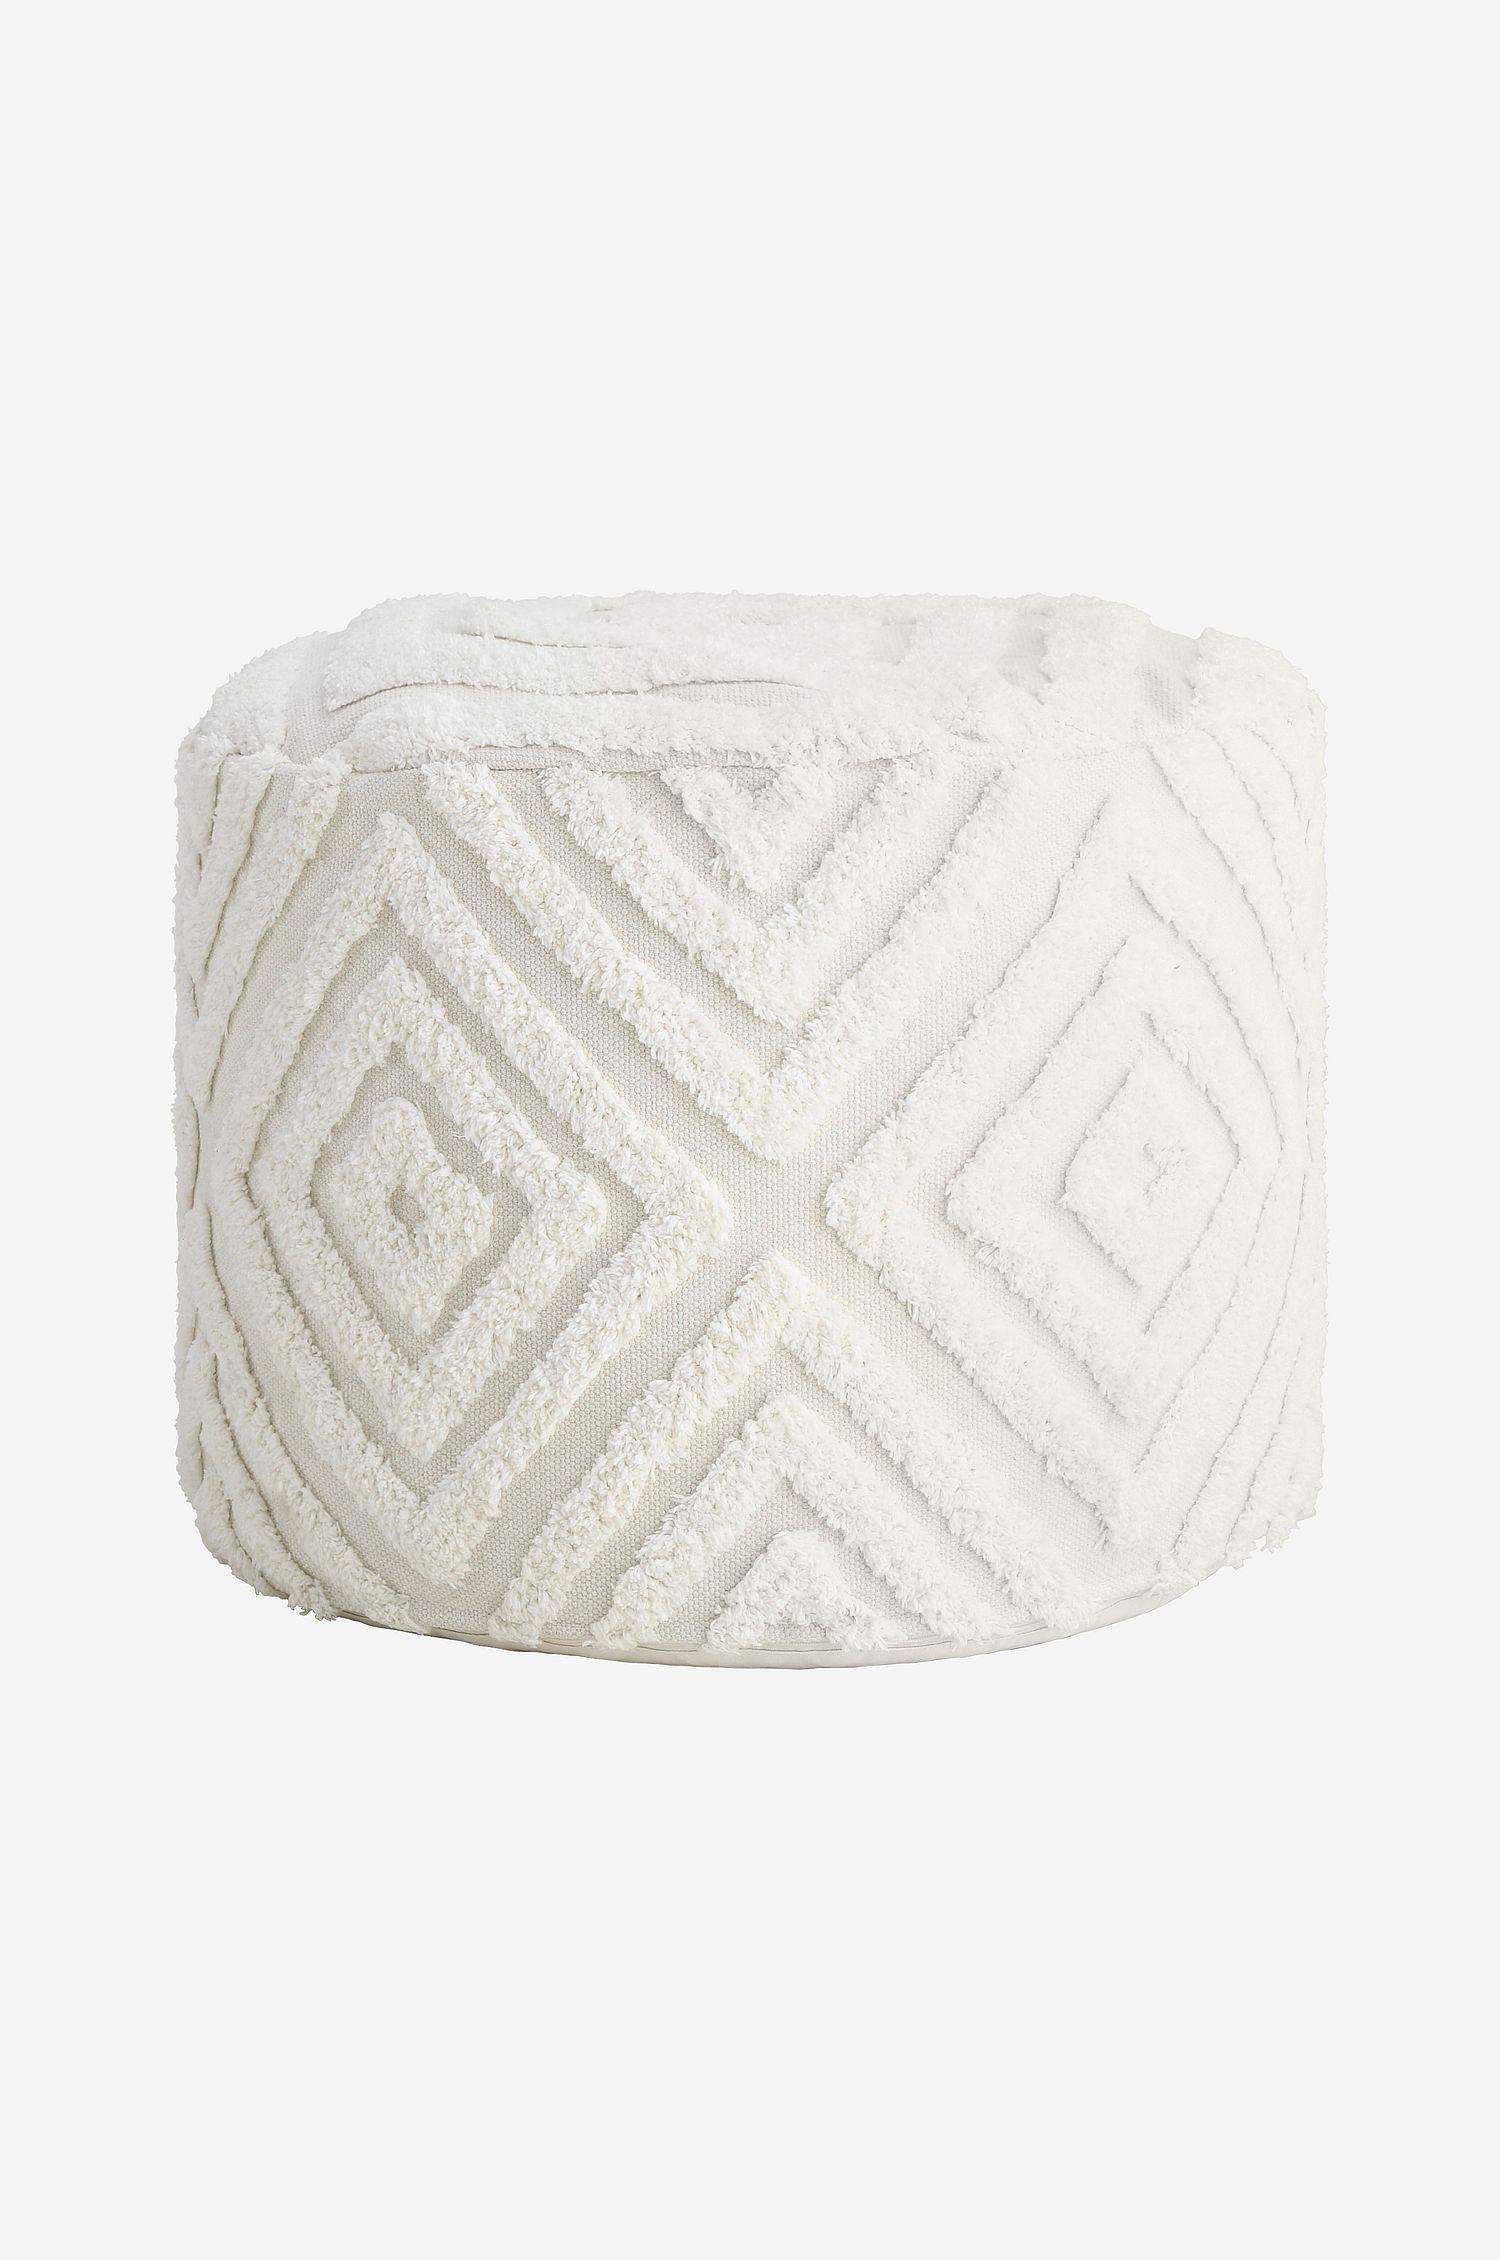 Hvit puff med mønster